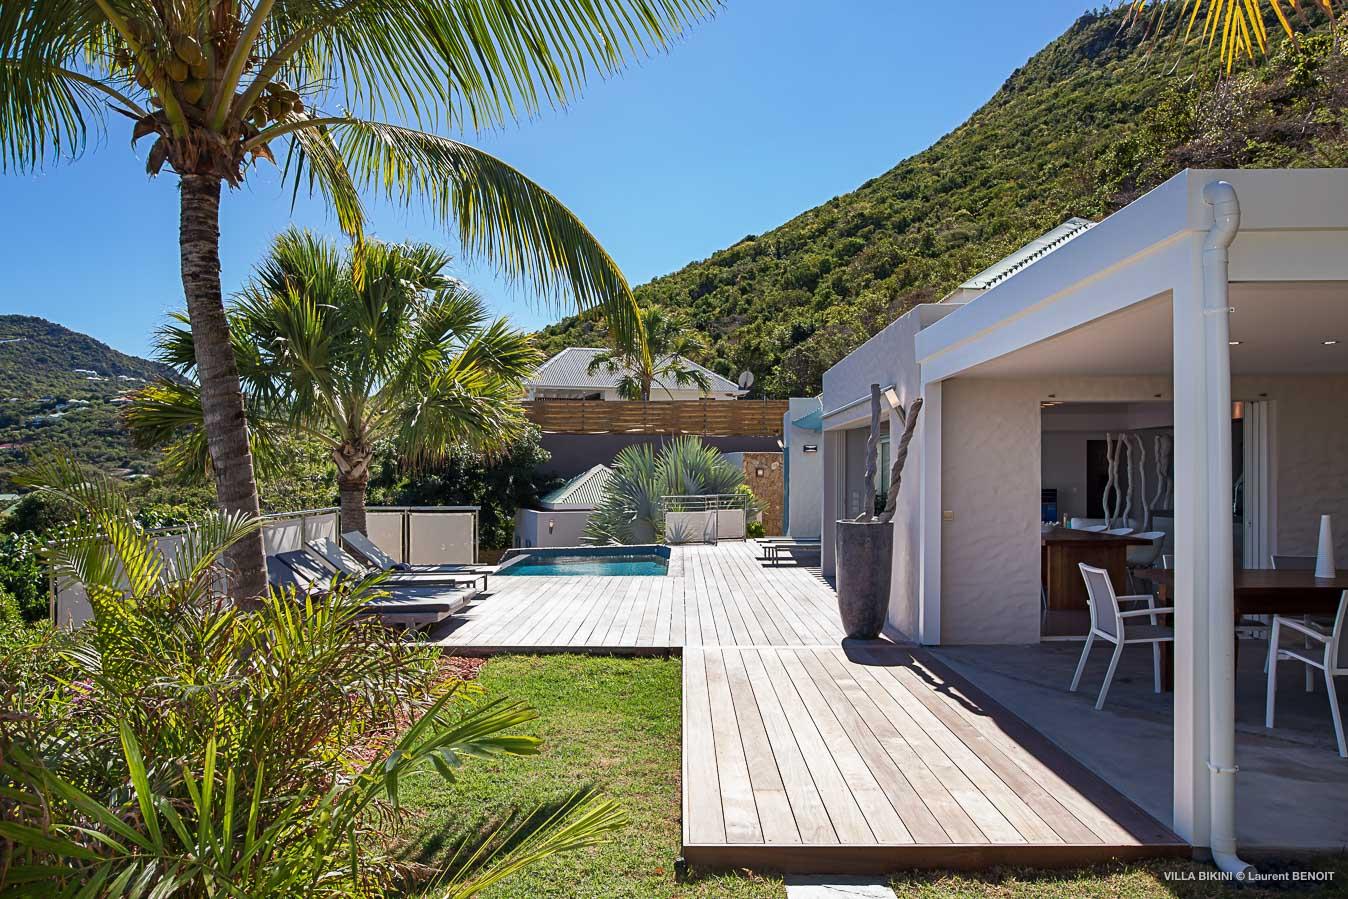 villa seasonal rentals 3 bedrooms st barts, lorient st barthelemy